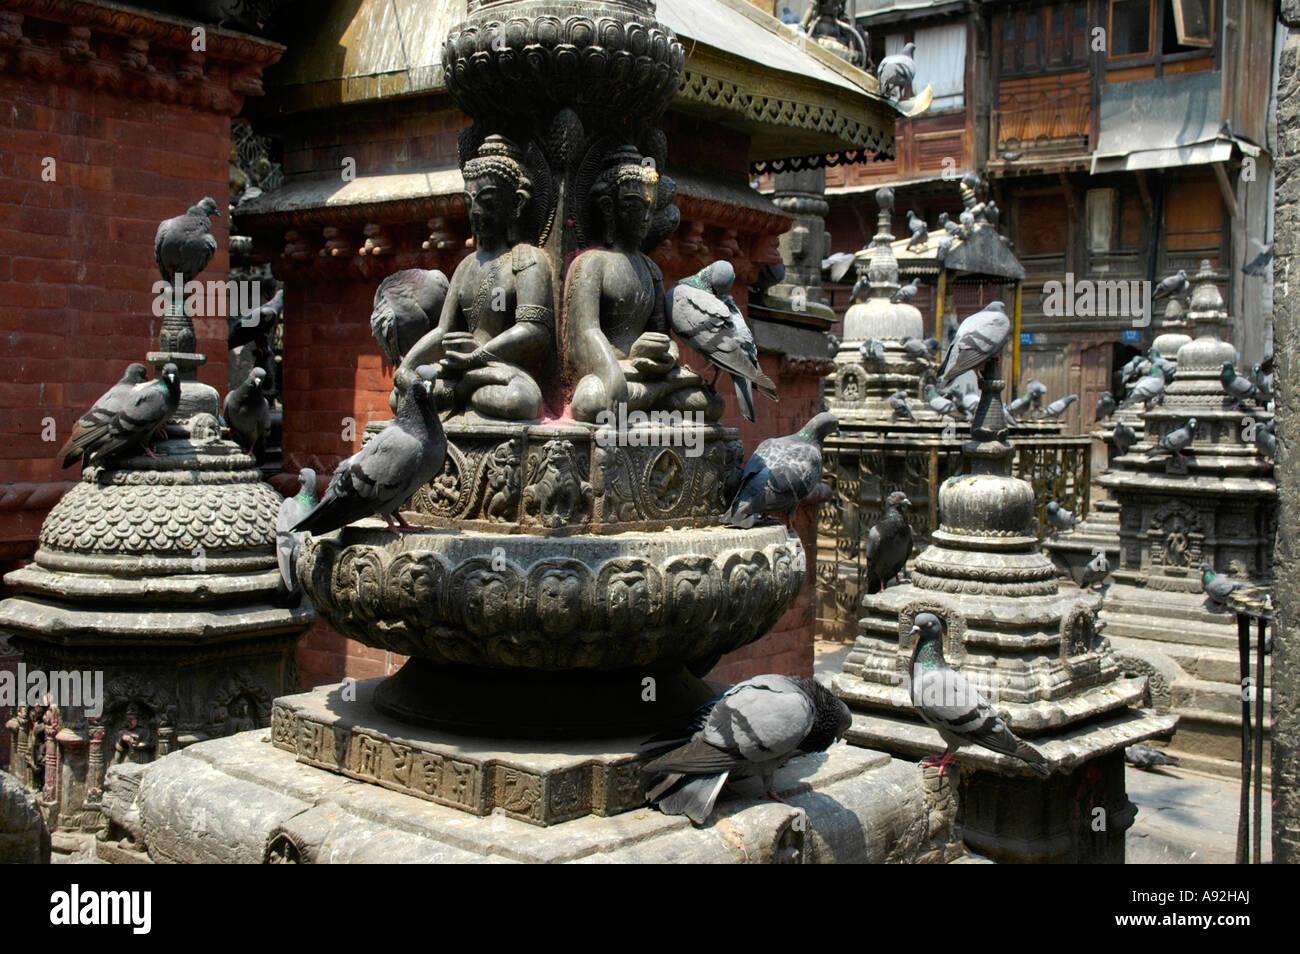 Many shrines chaityas and statues with pigeons in Seto Macchendranath Temple Kel Tole Kathmandu Nepal - Stock Image